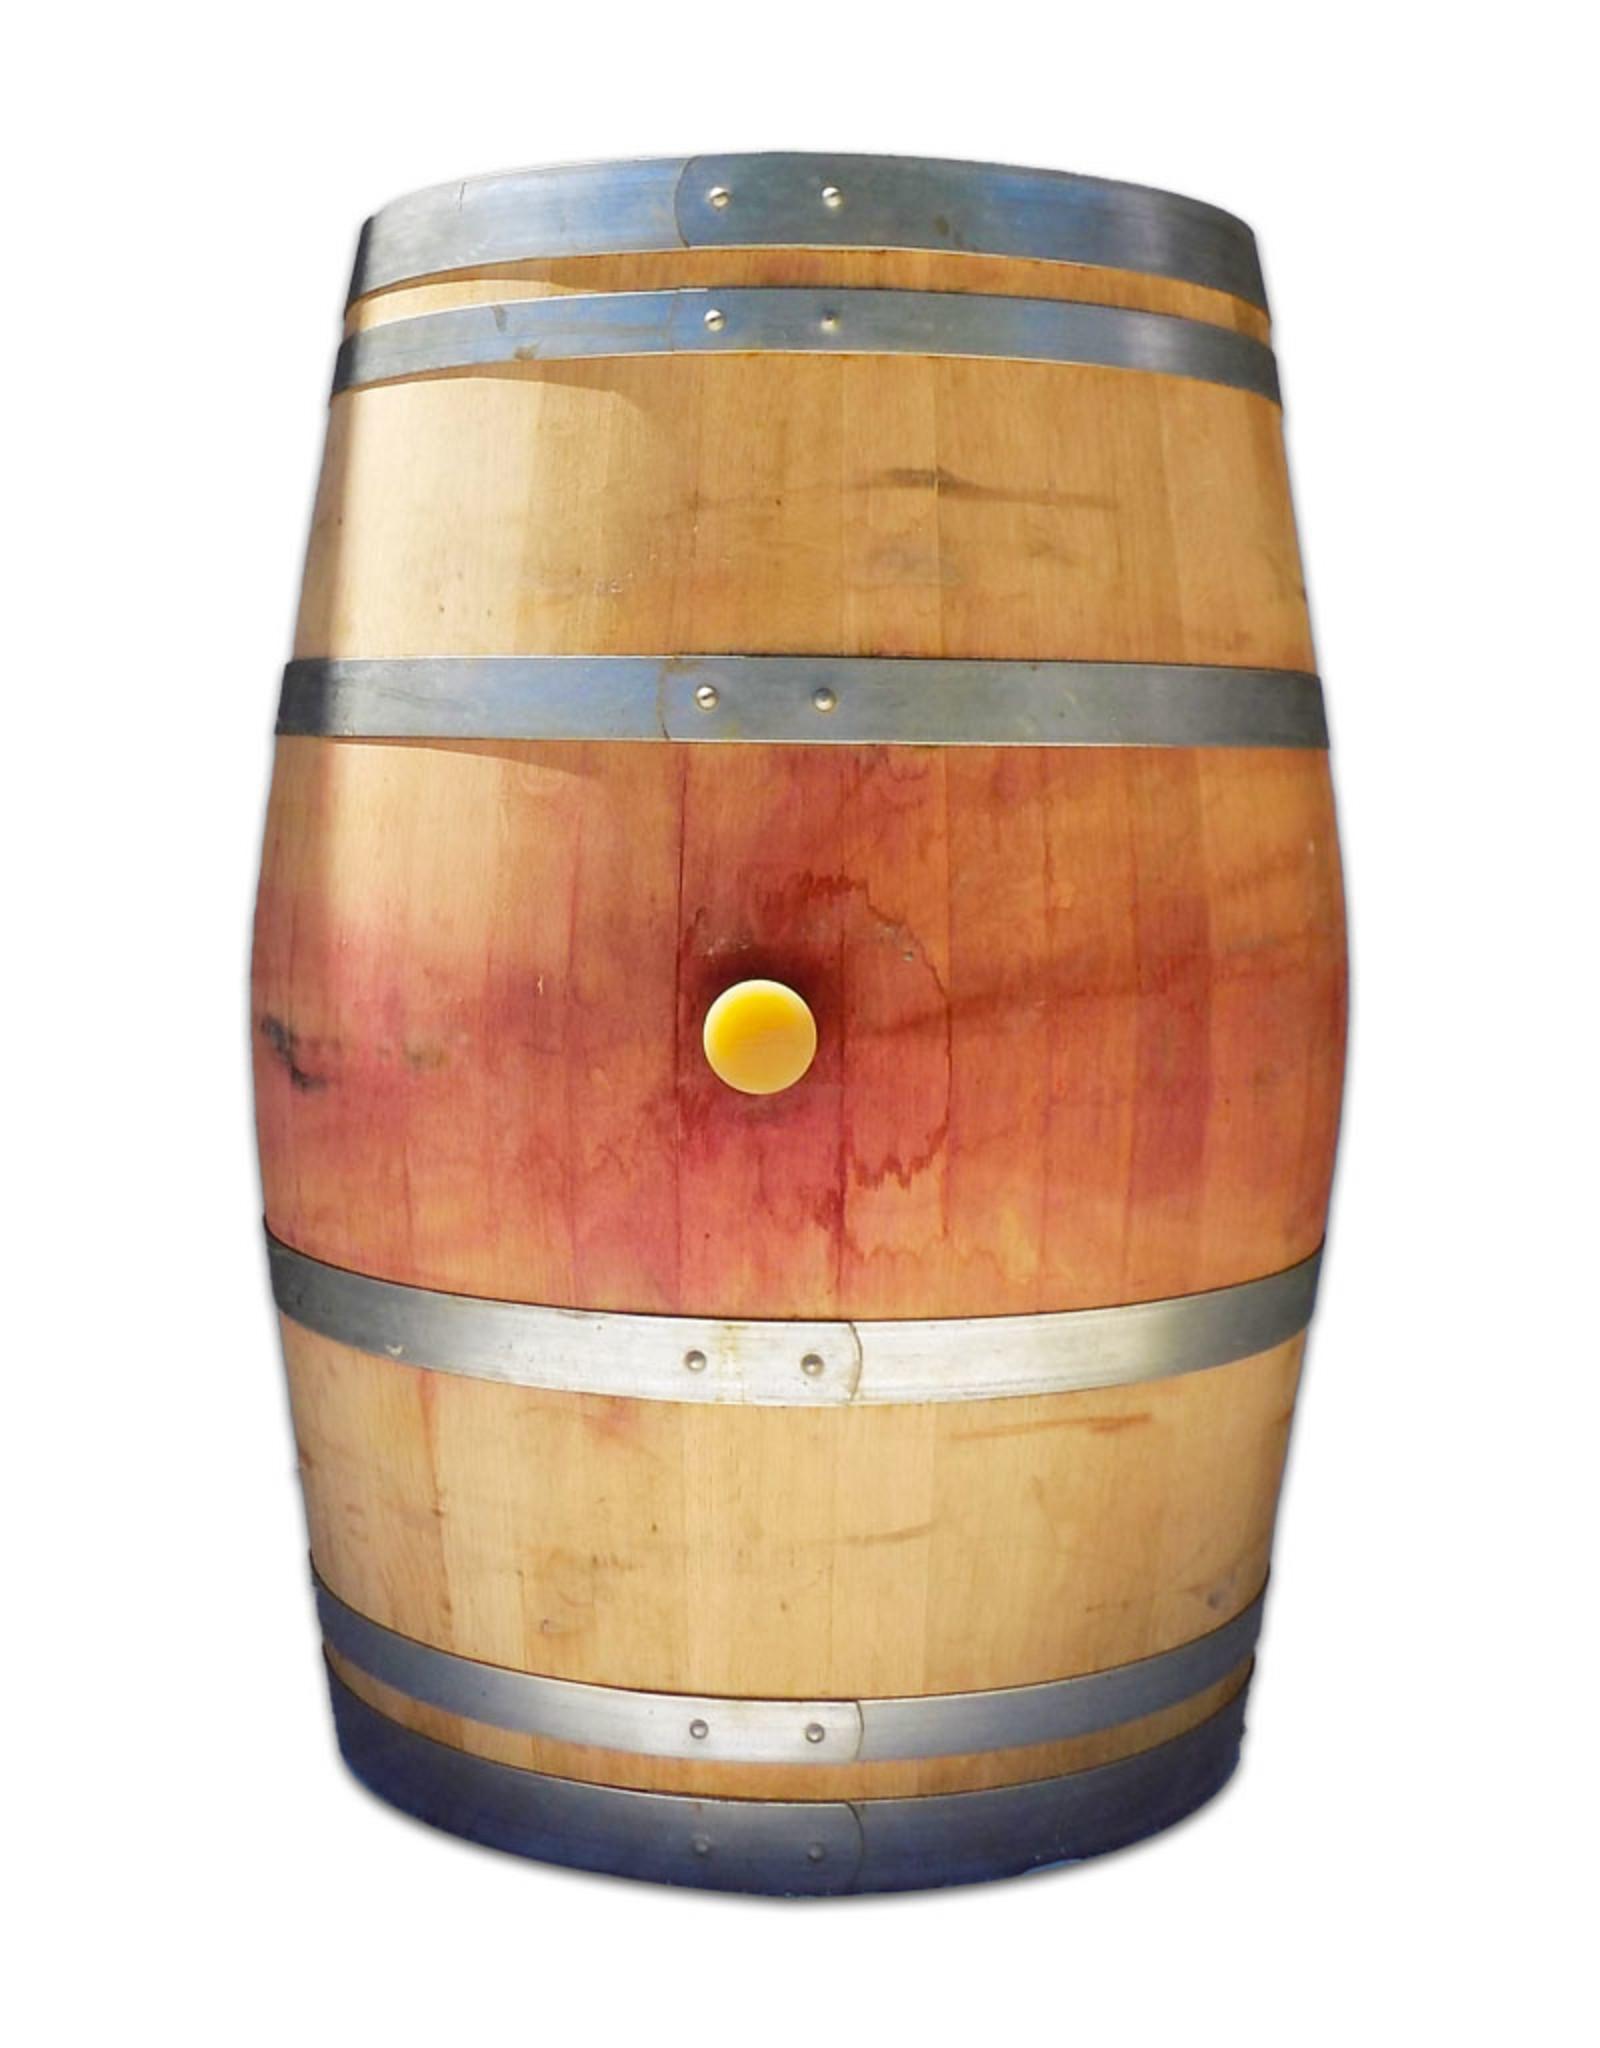 225 L RED WINE BARREL GRAND CRU BORDEAUX